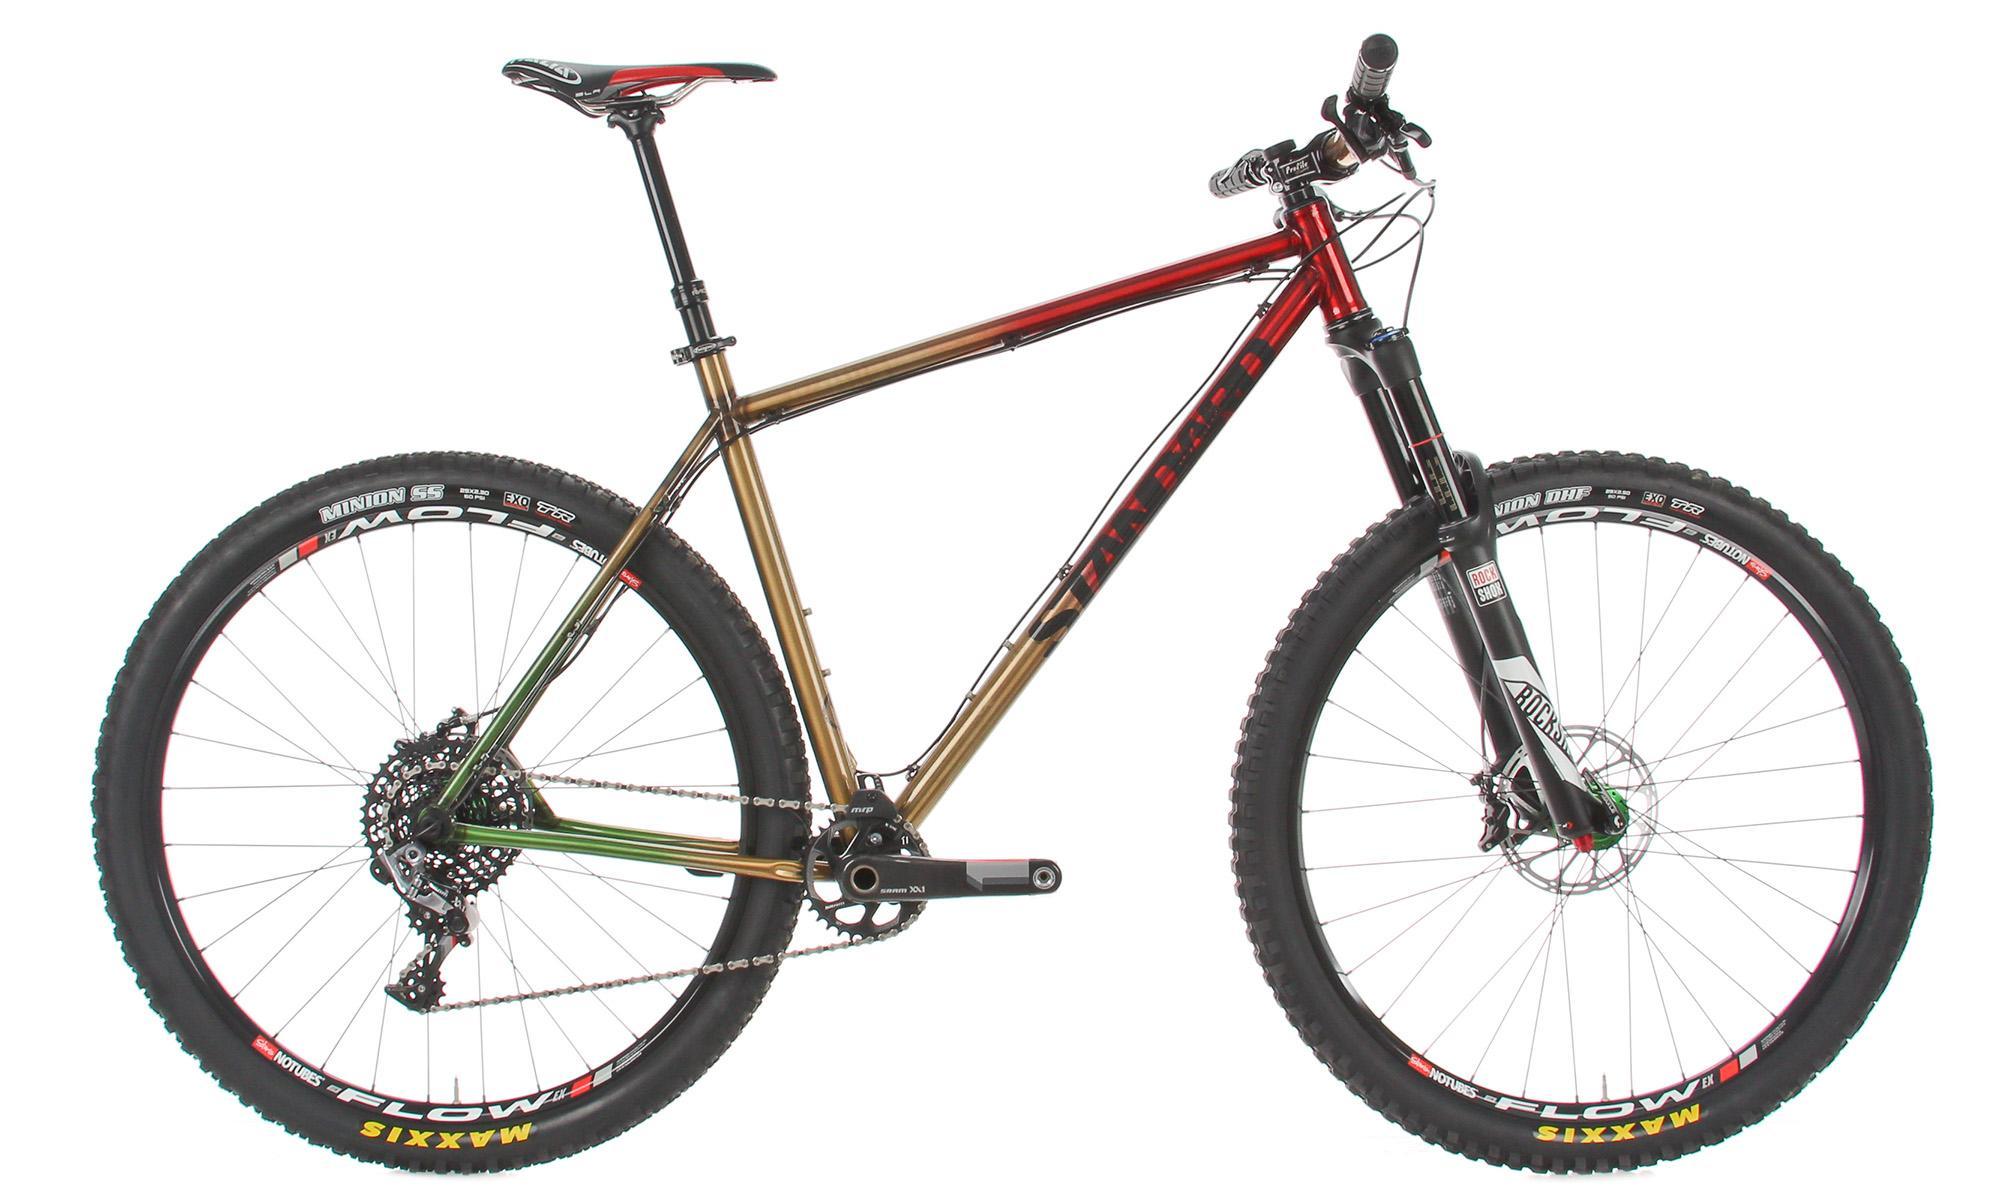 Standard Byke Co Rudeboy Hardtail 29r | The Radavist | A